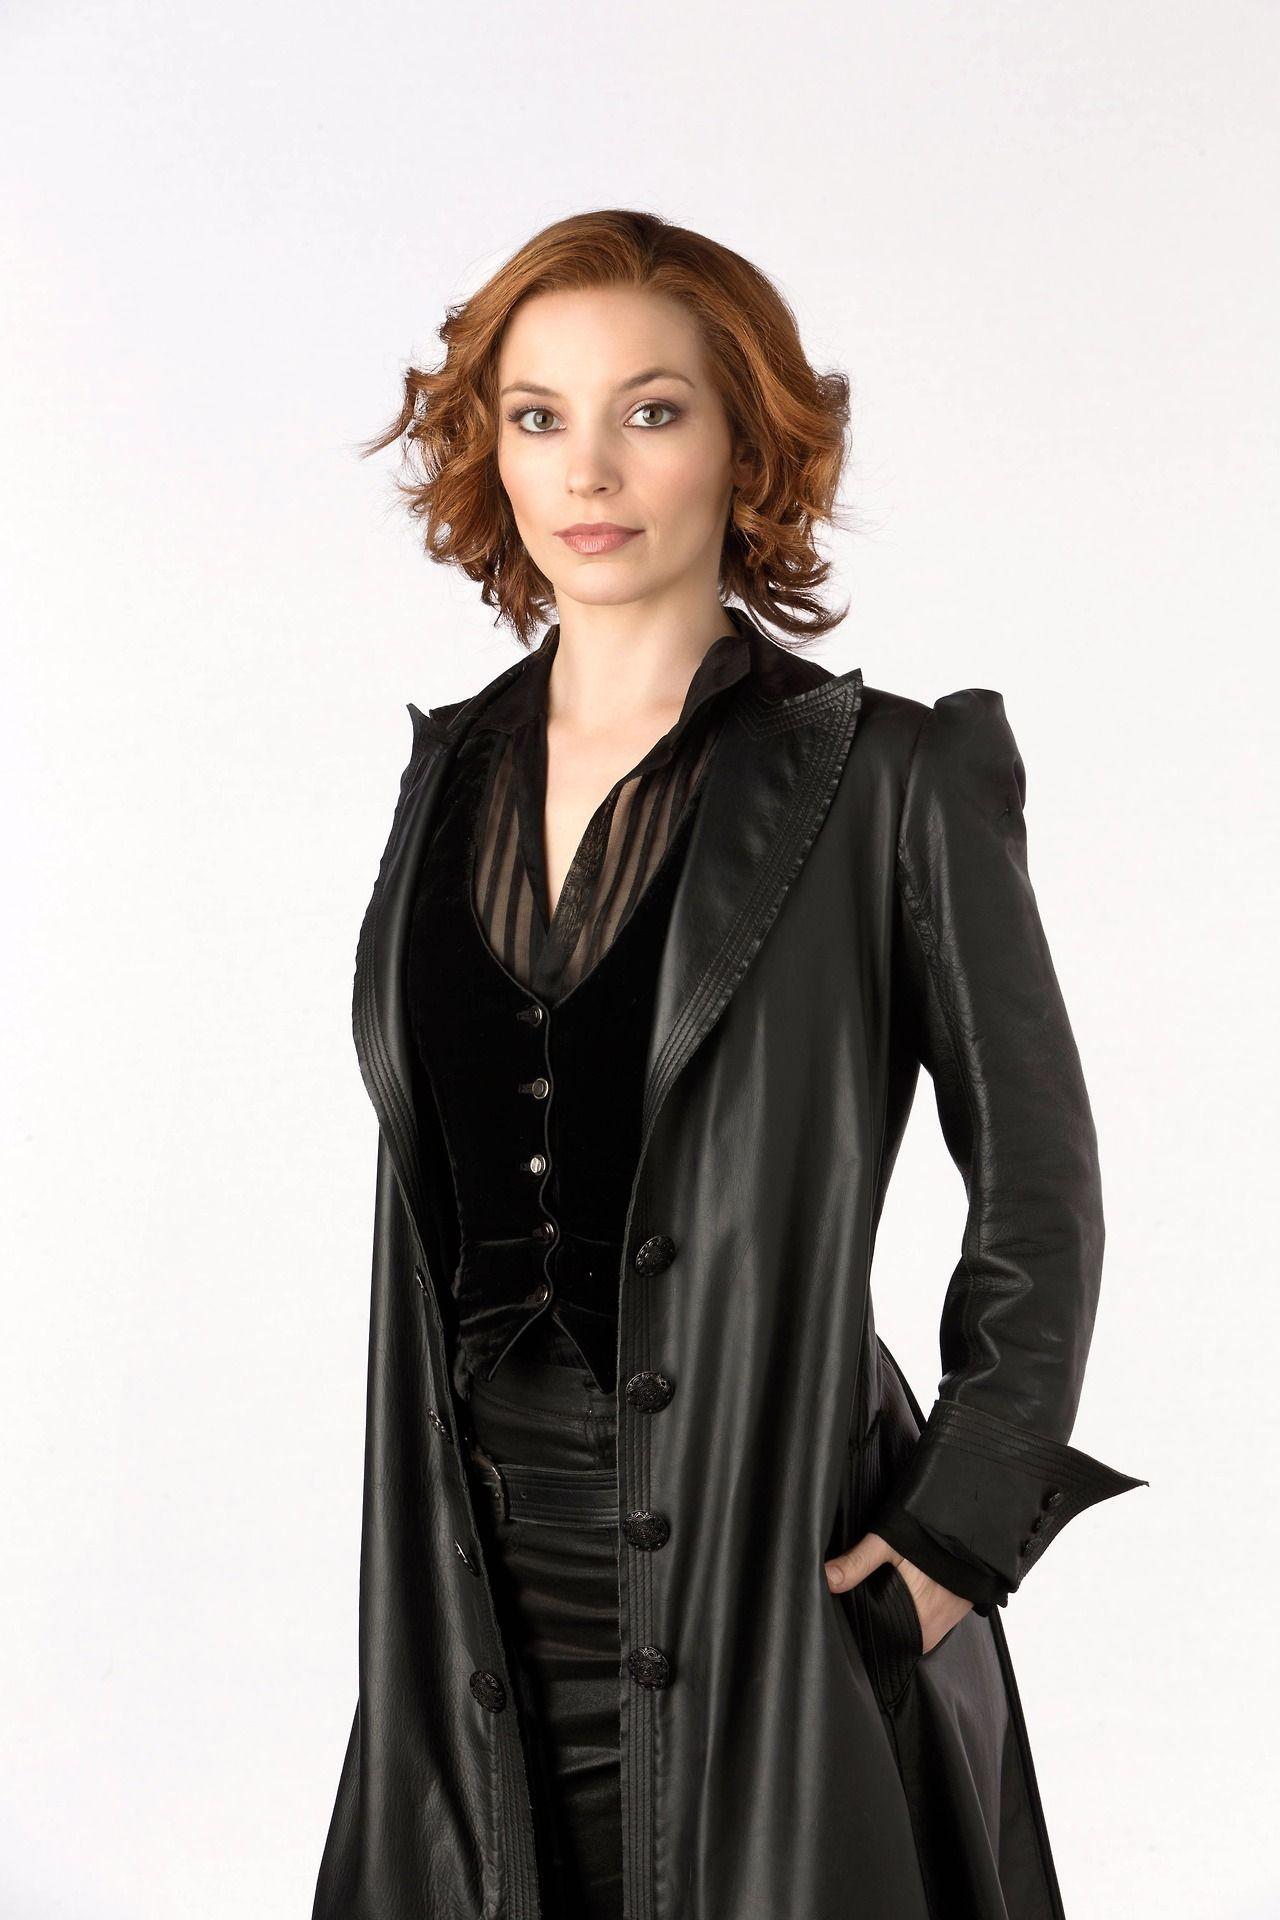 Kate Baines (born 1978),Susan Travers (actress) Porn tube Jo Warne,Matilda Sturridge